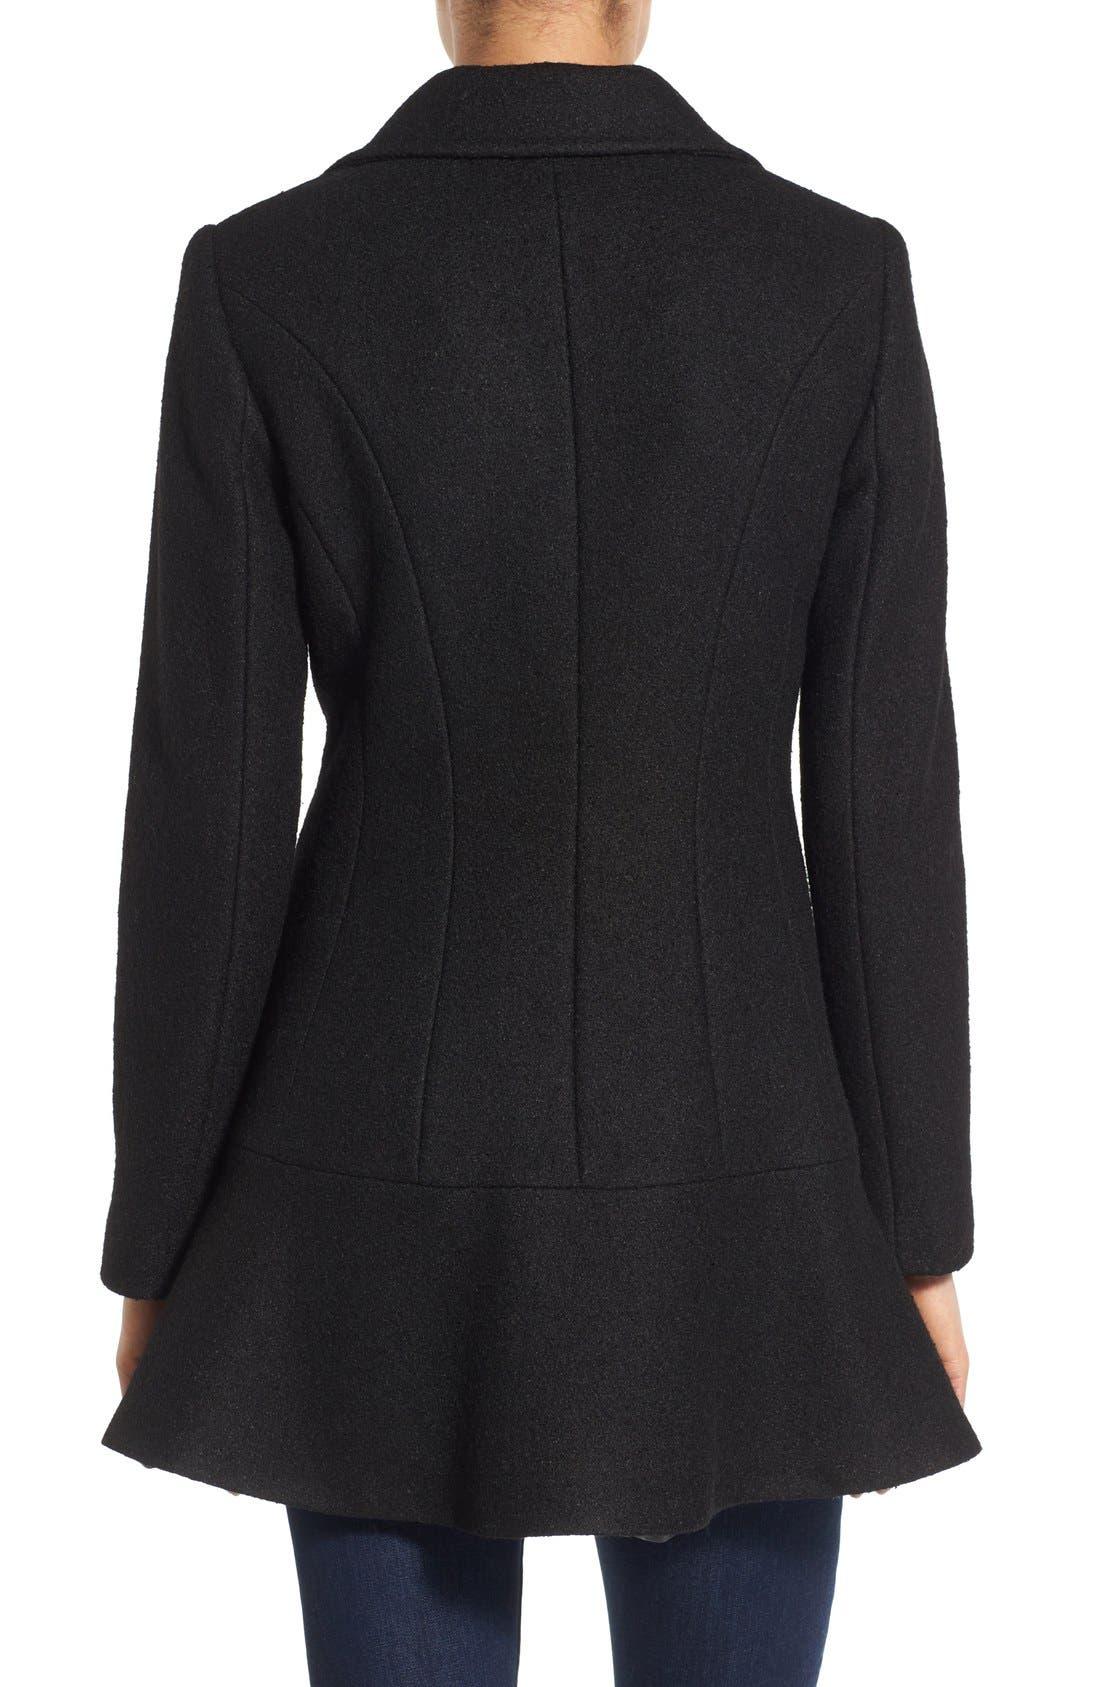 Notch Lapel Peplum Coat,                             Alternate thumbnail 2, color,                             Black